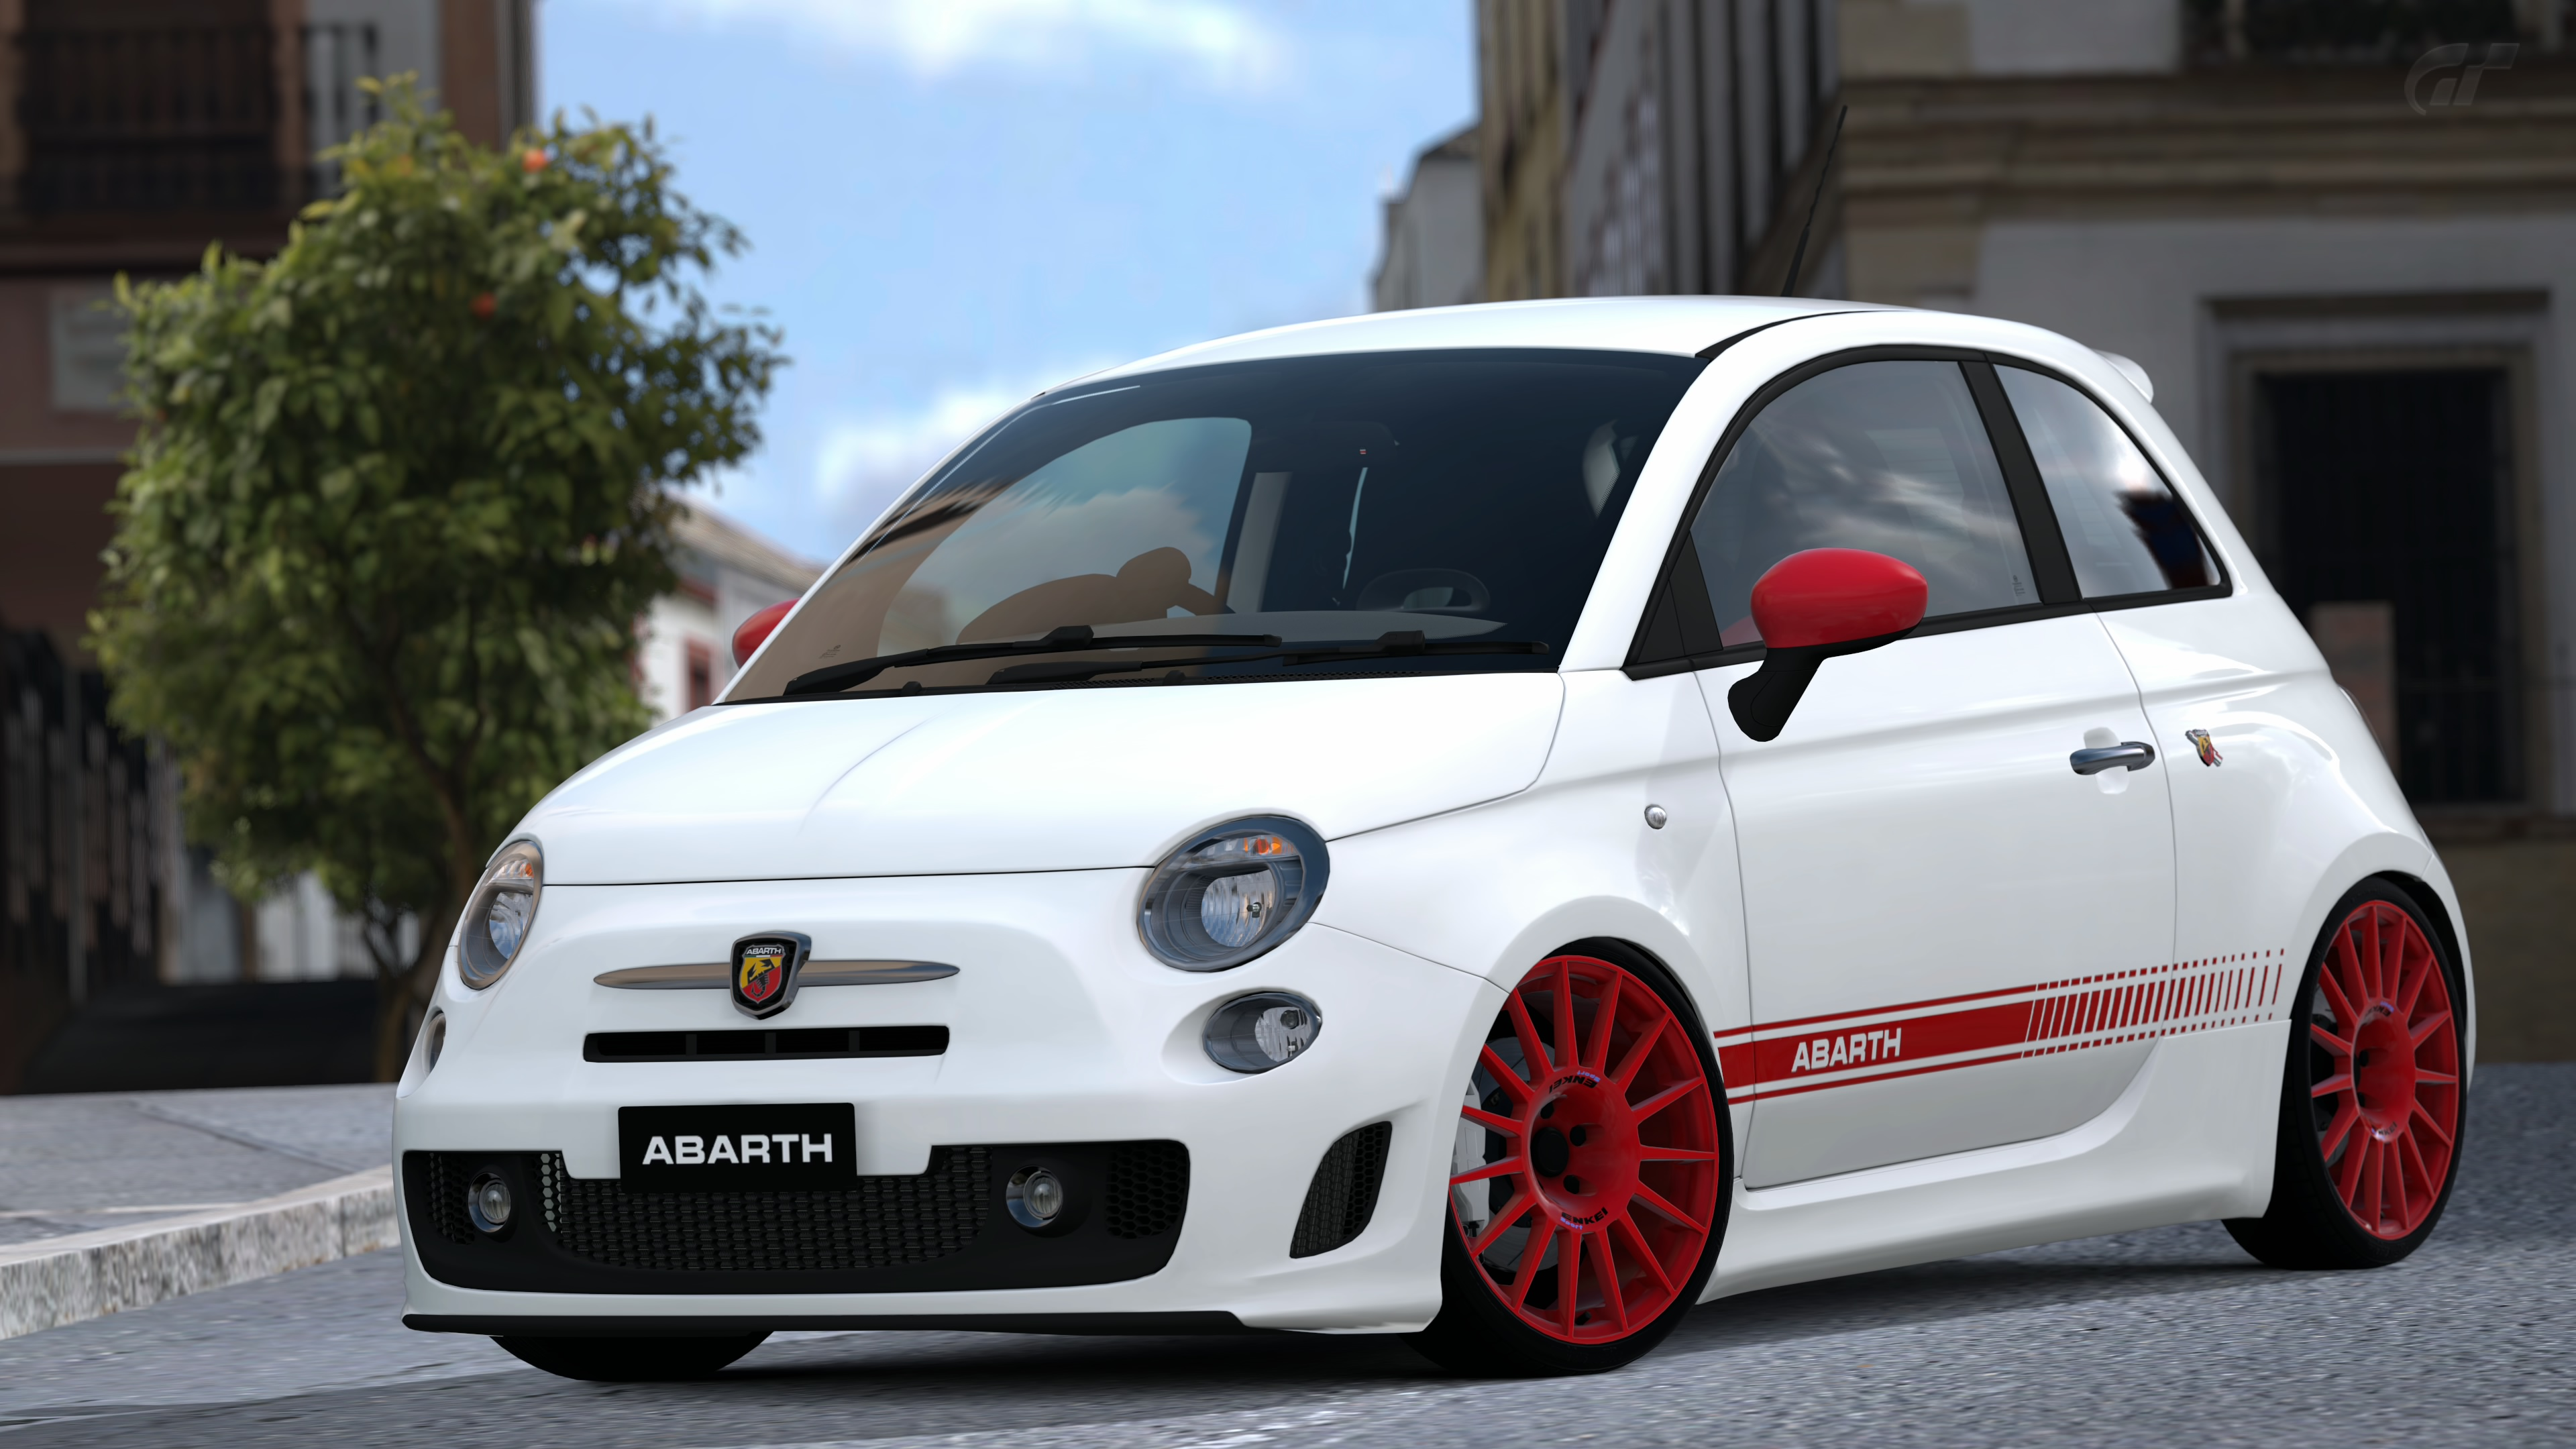 Fiat 500 Abarth Gran Turismo 6 By Vertualissimo On